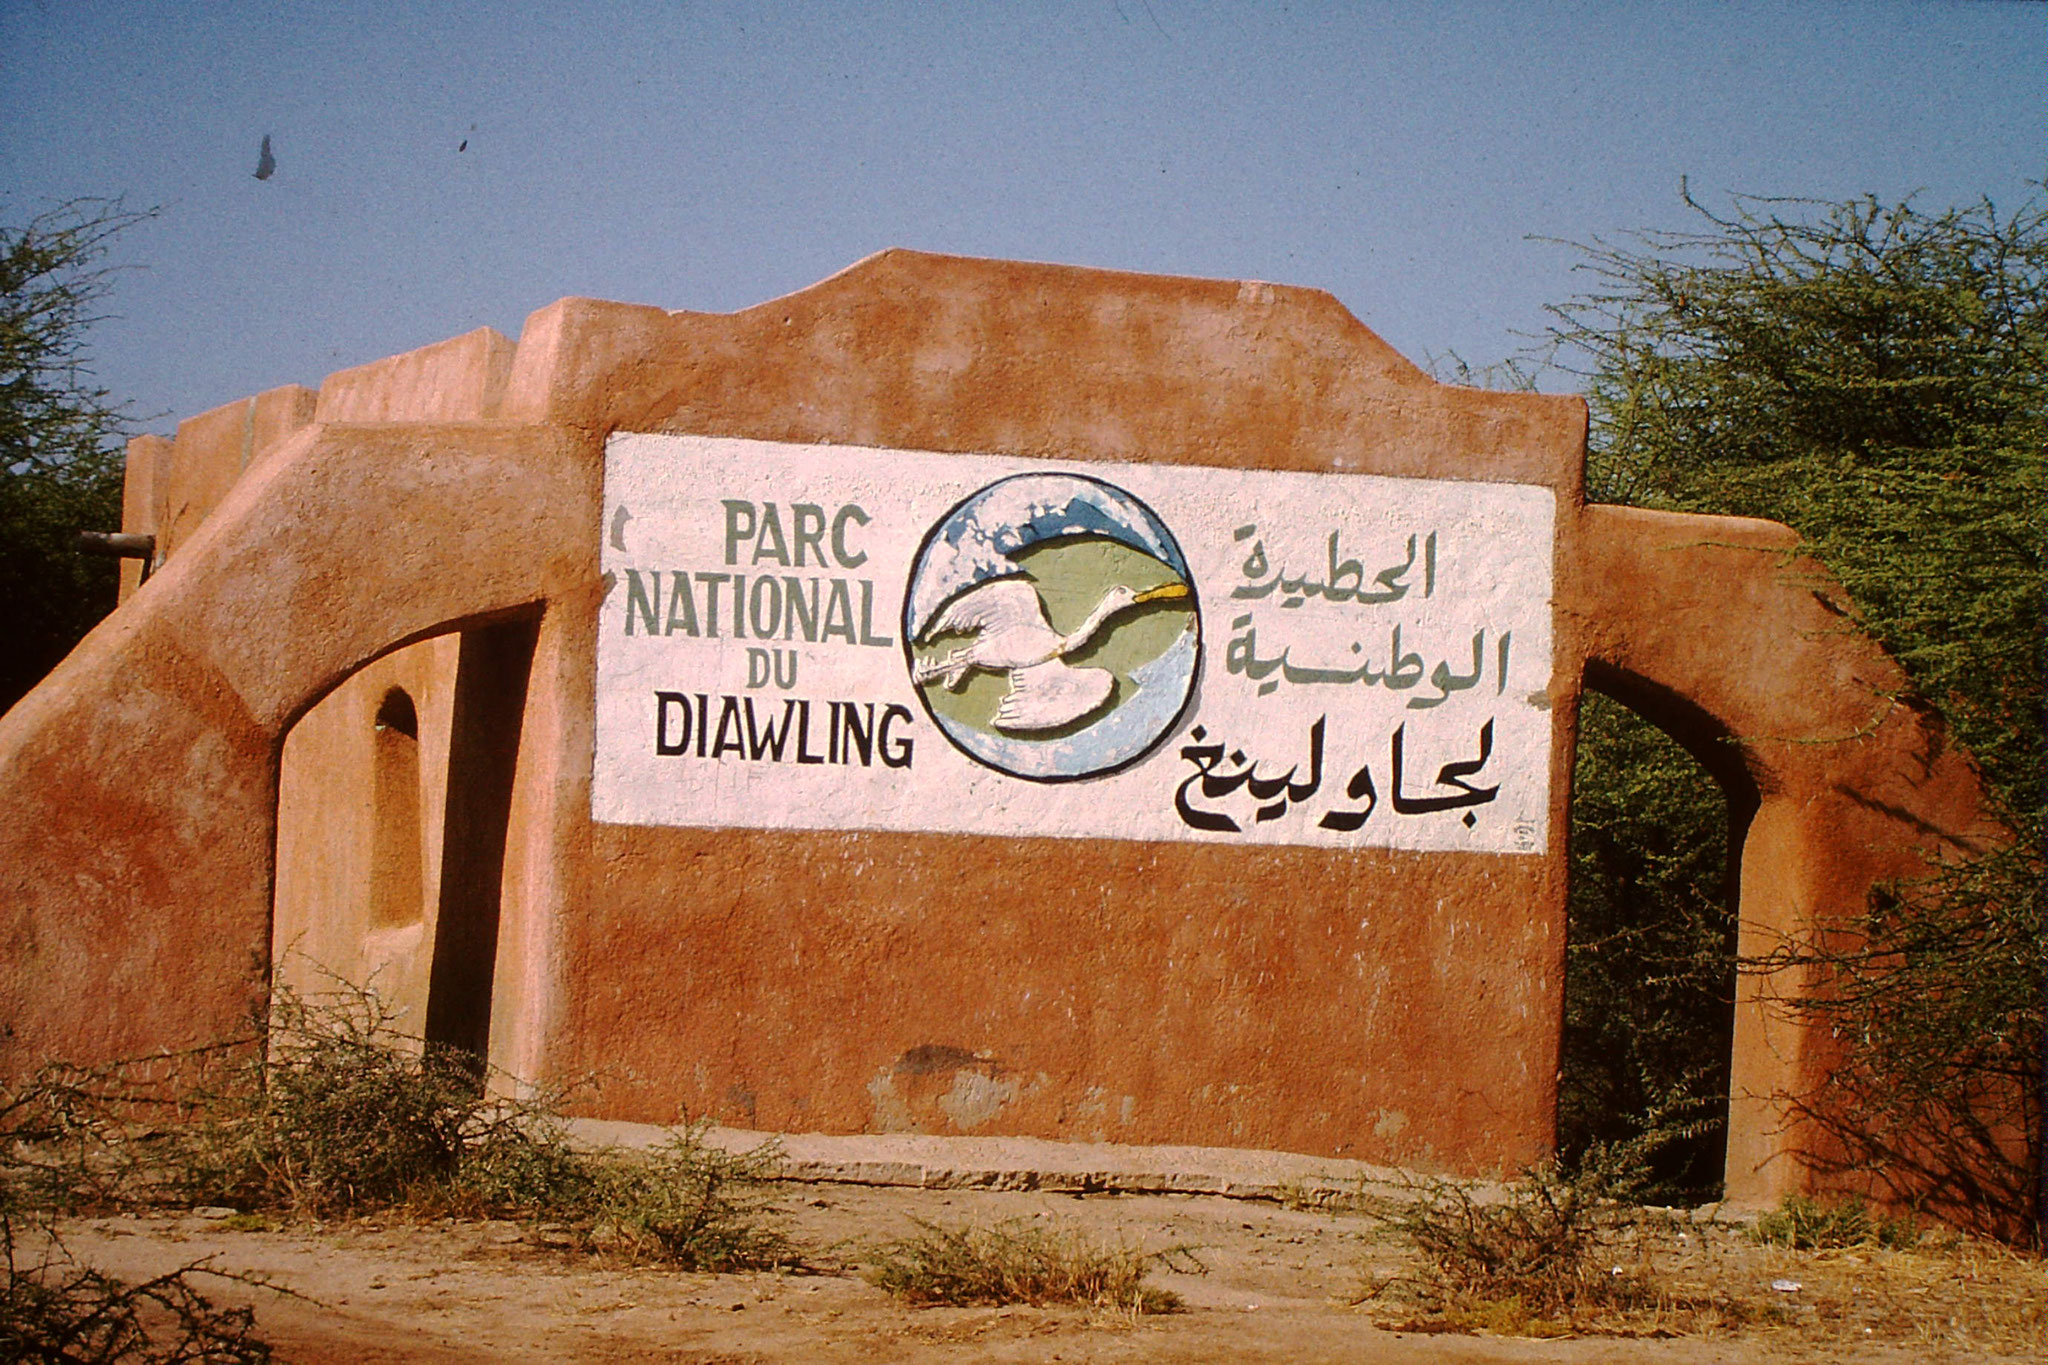 Nationalpark Diawling.